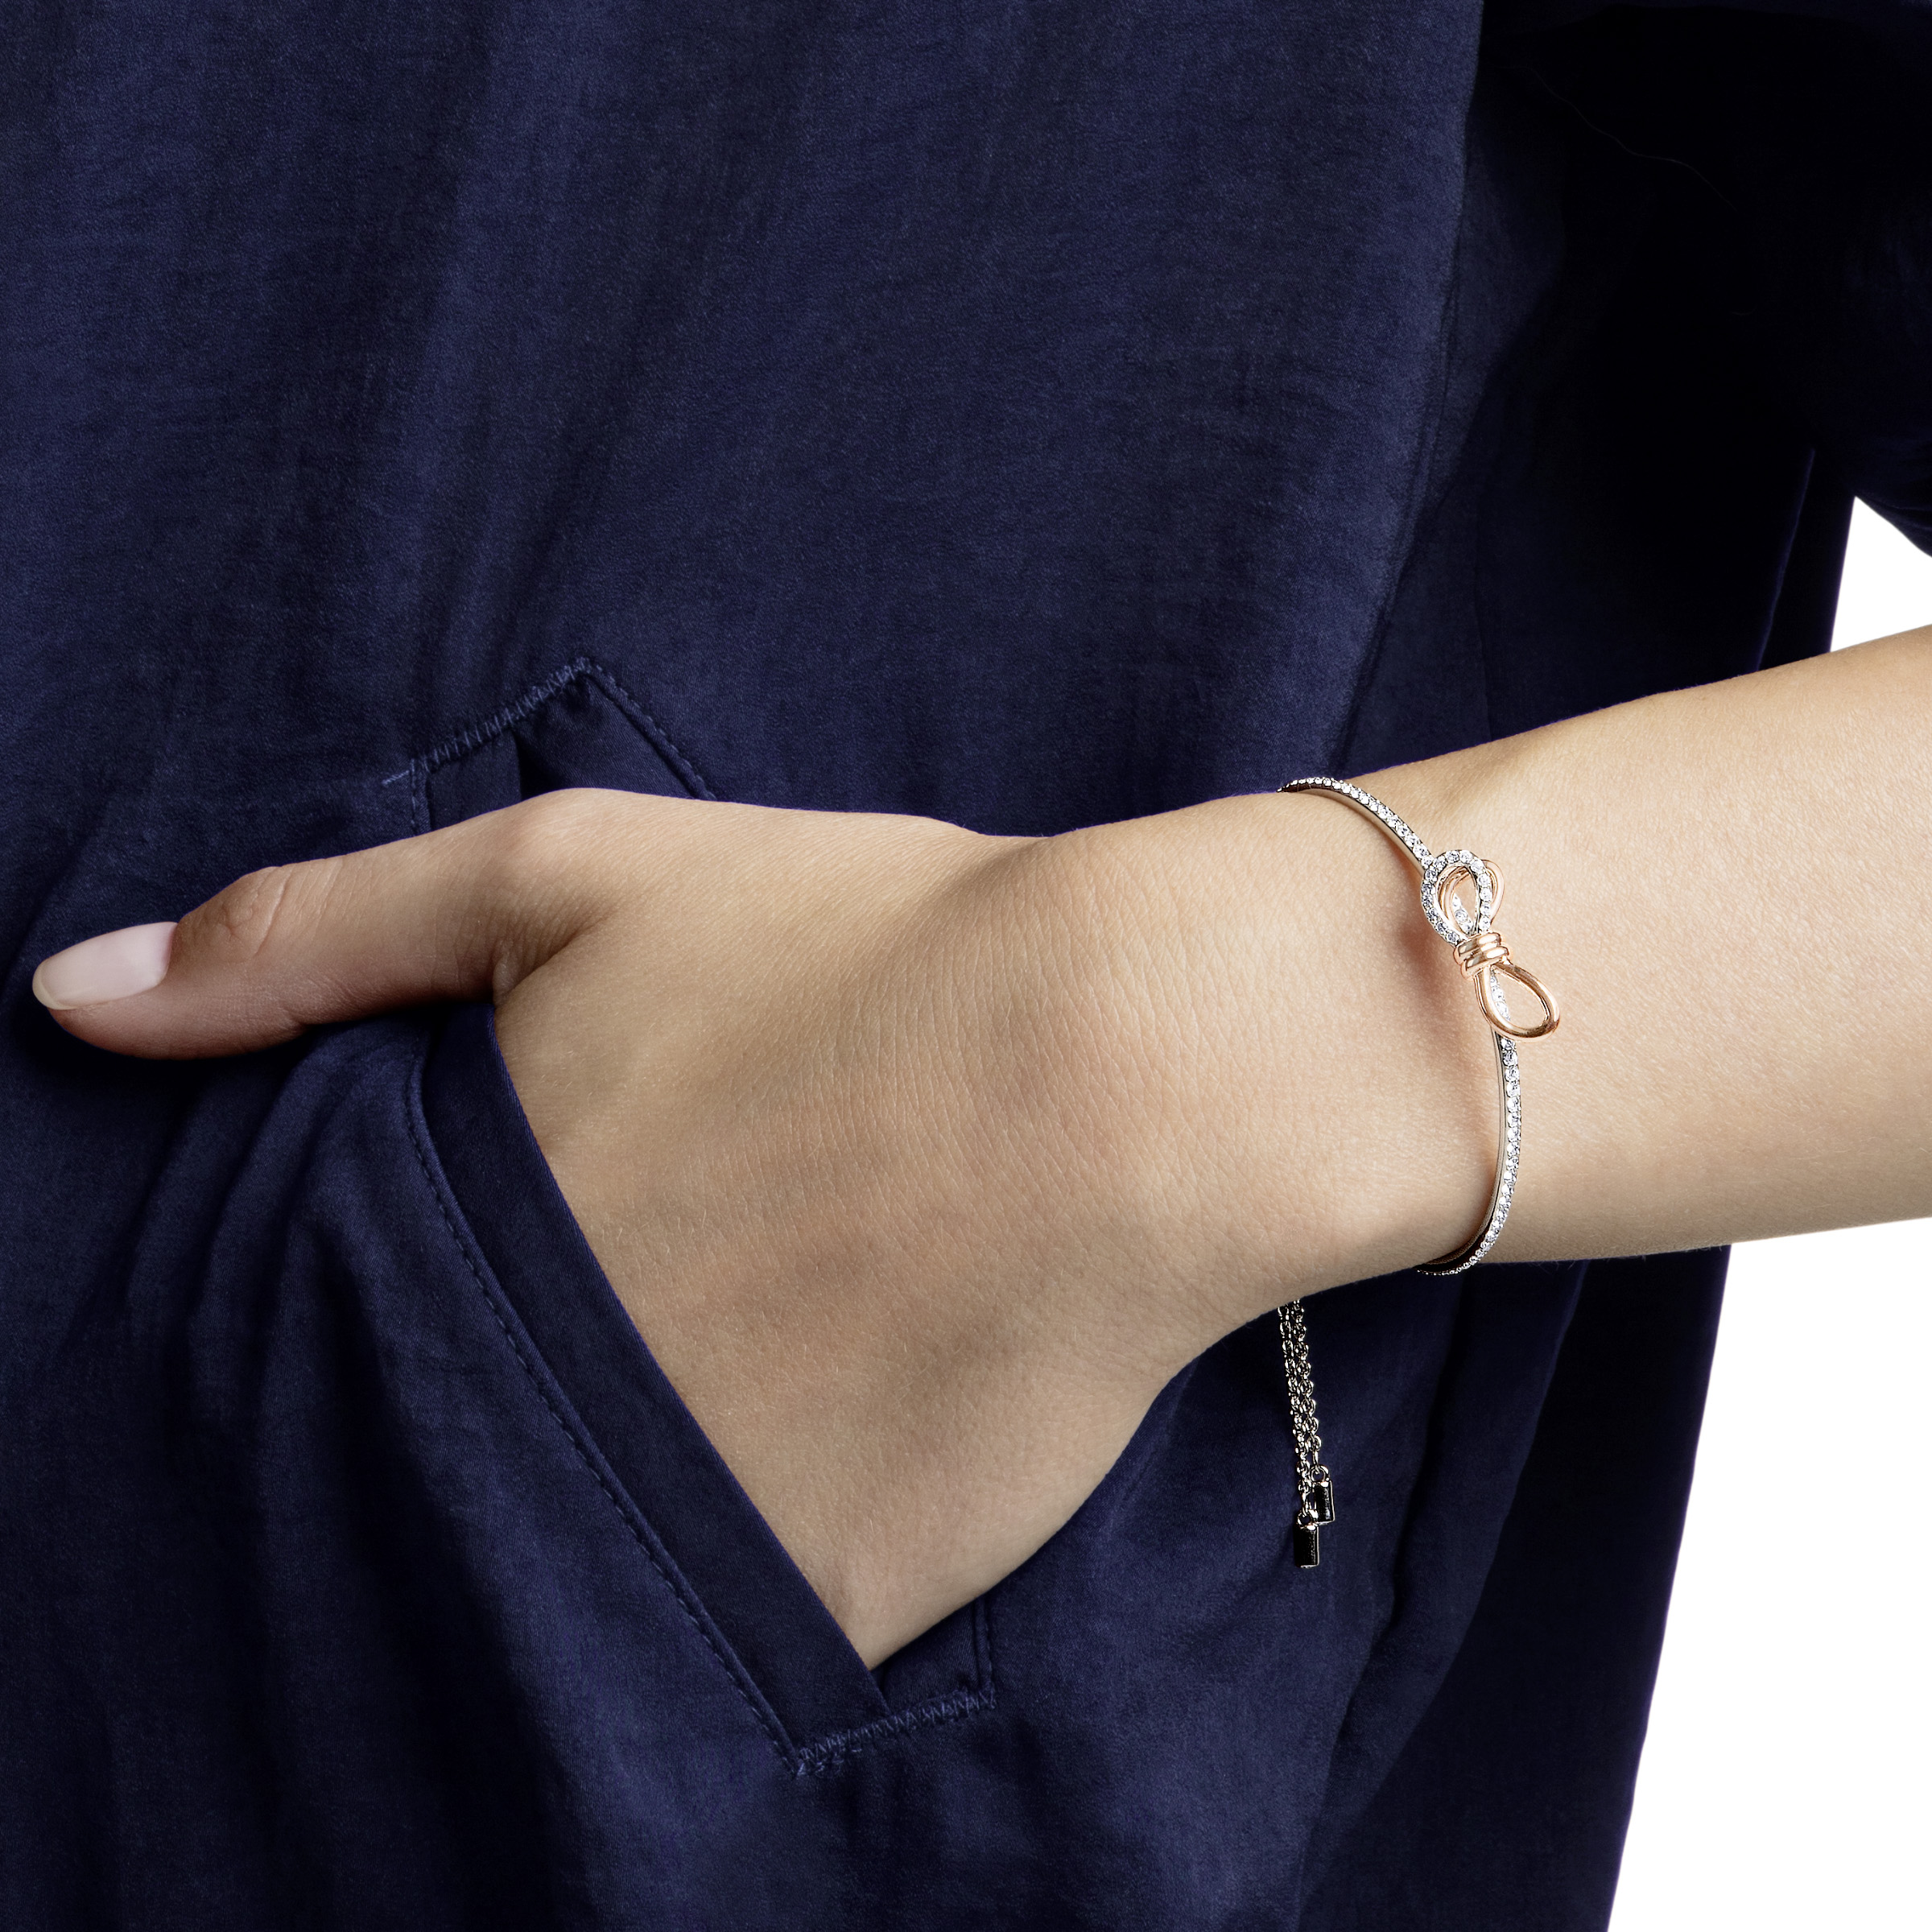 Bracelet-jonc Lifelong Bow, blanc, Finition mix de métal, Swarovski